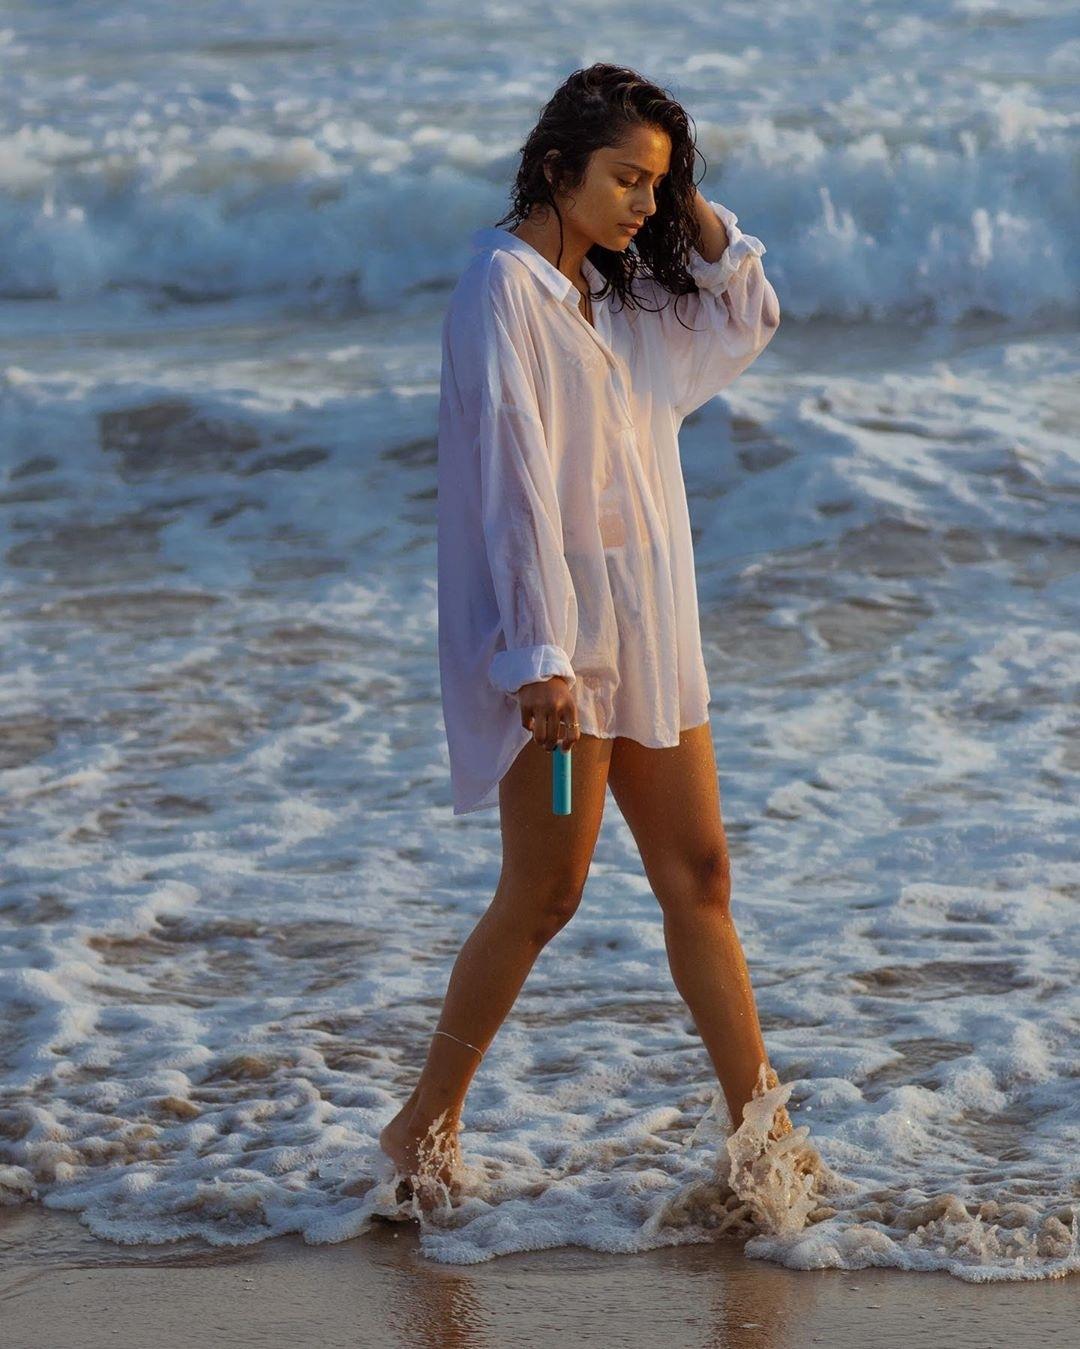 Singer Pragathis stunning beach photo rocks internet!